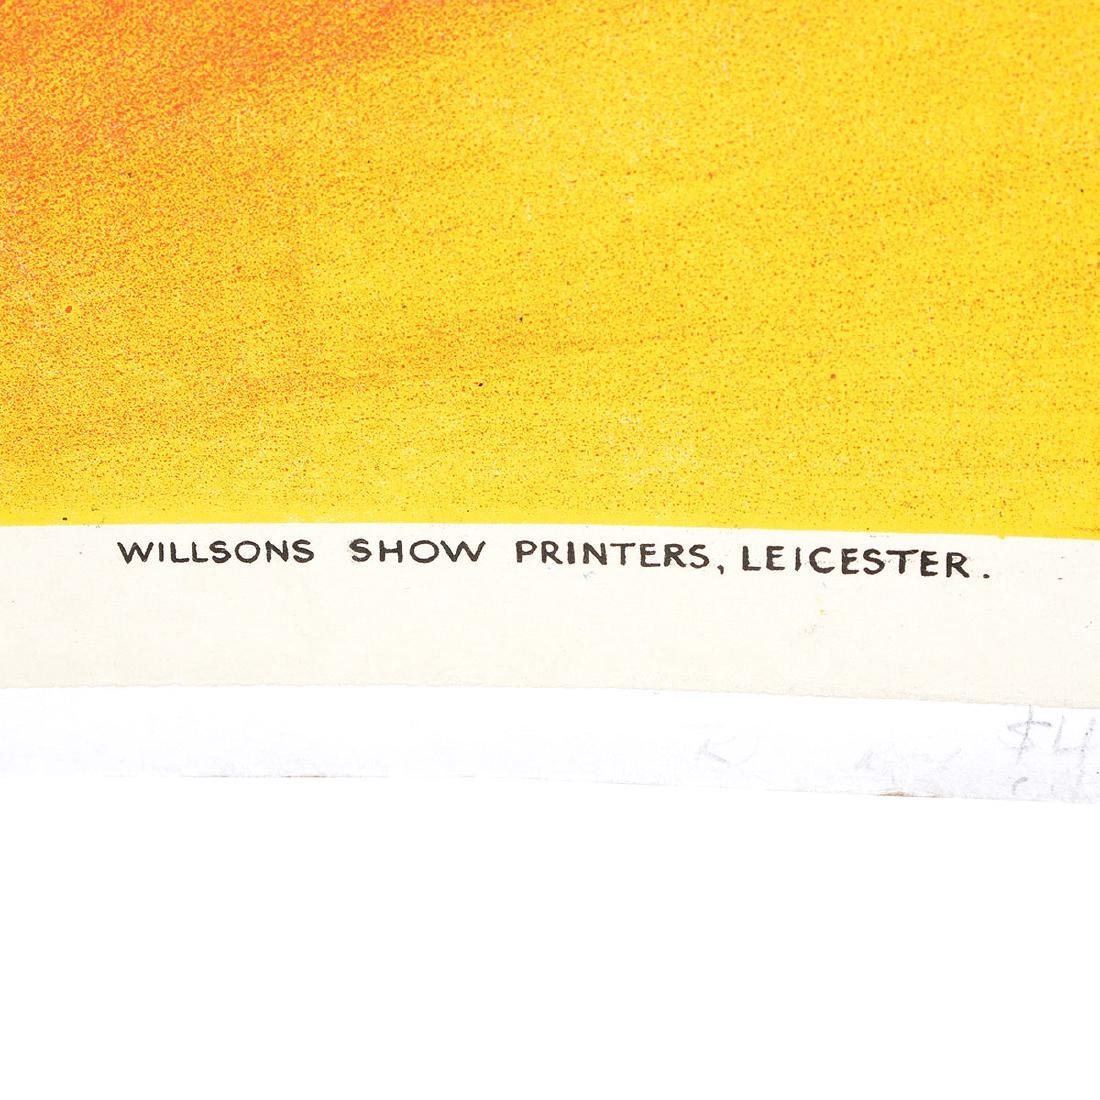 European lithograph posters Circus Stock & Cig. Leo - 2